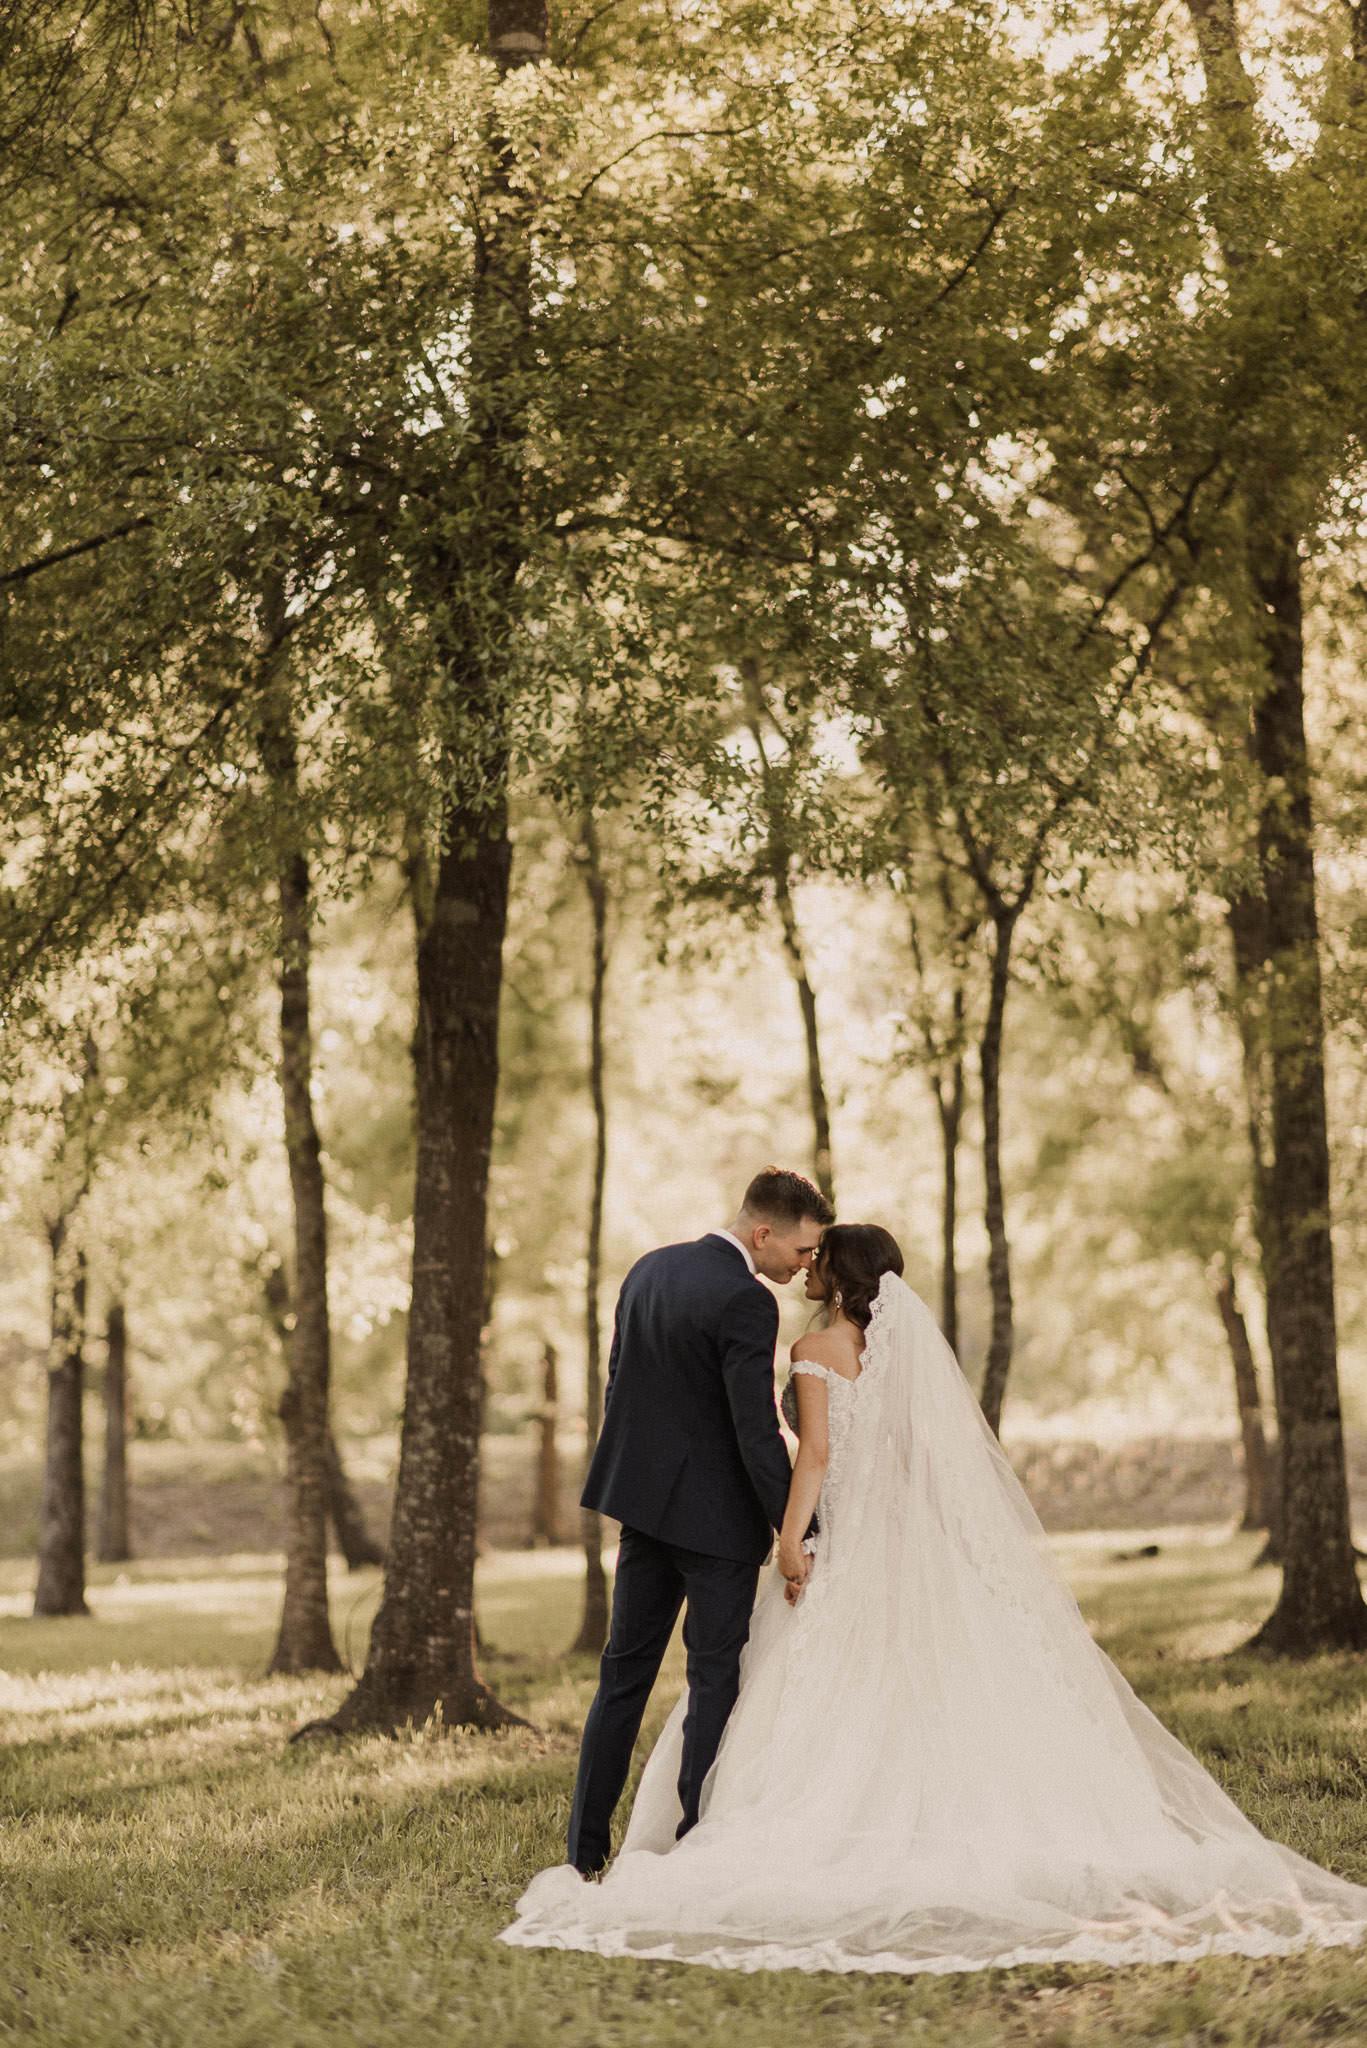 adriana-christian-wedding-re-sm-101.jpg